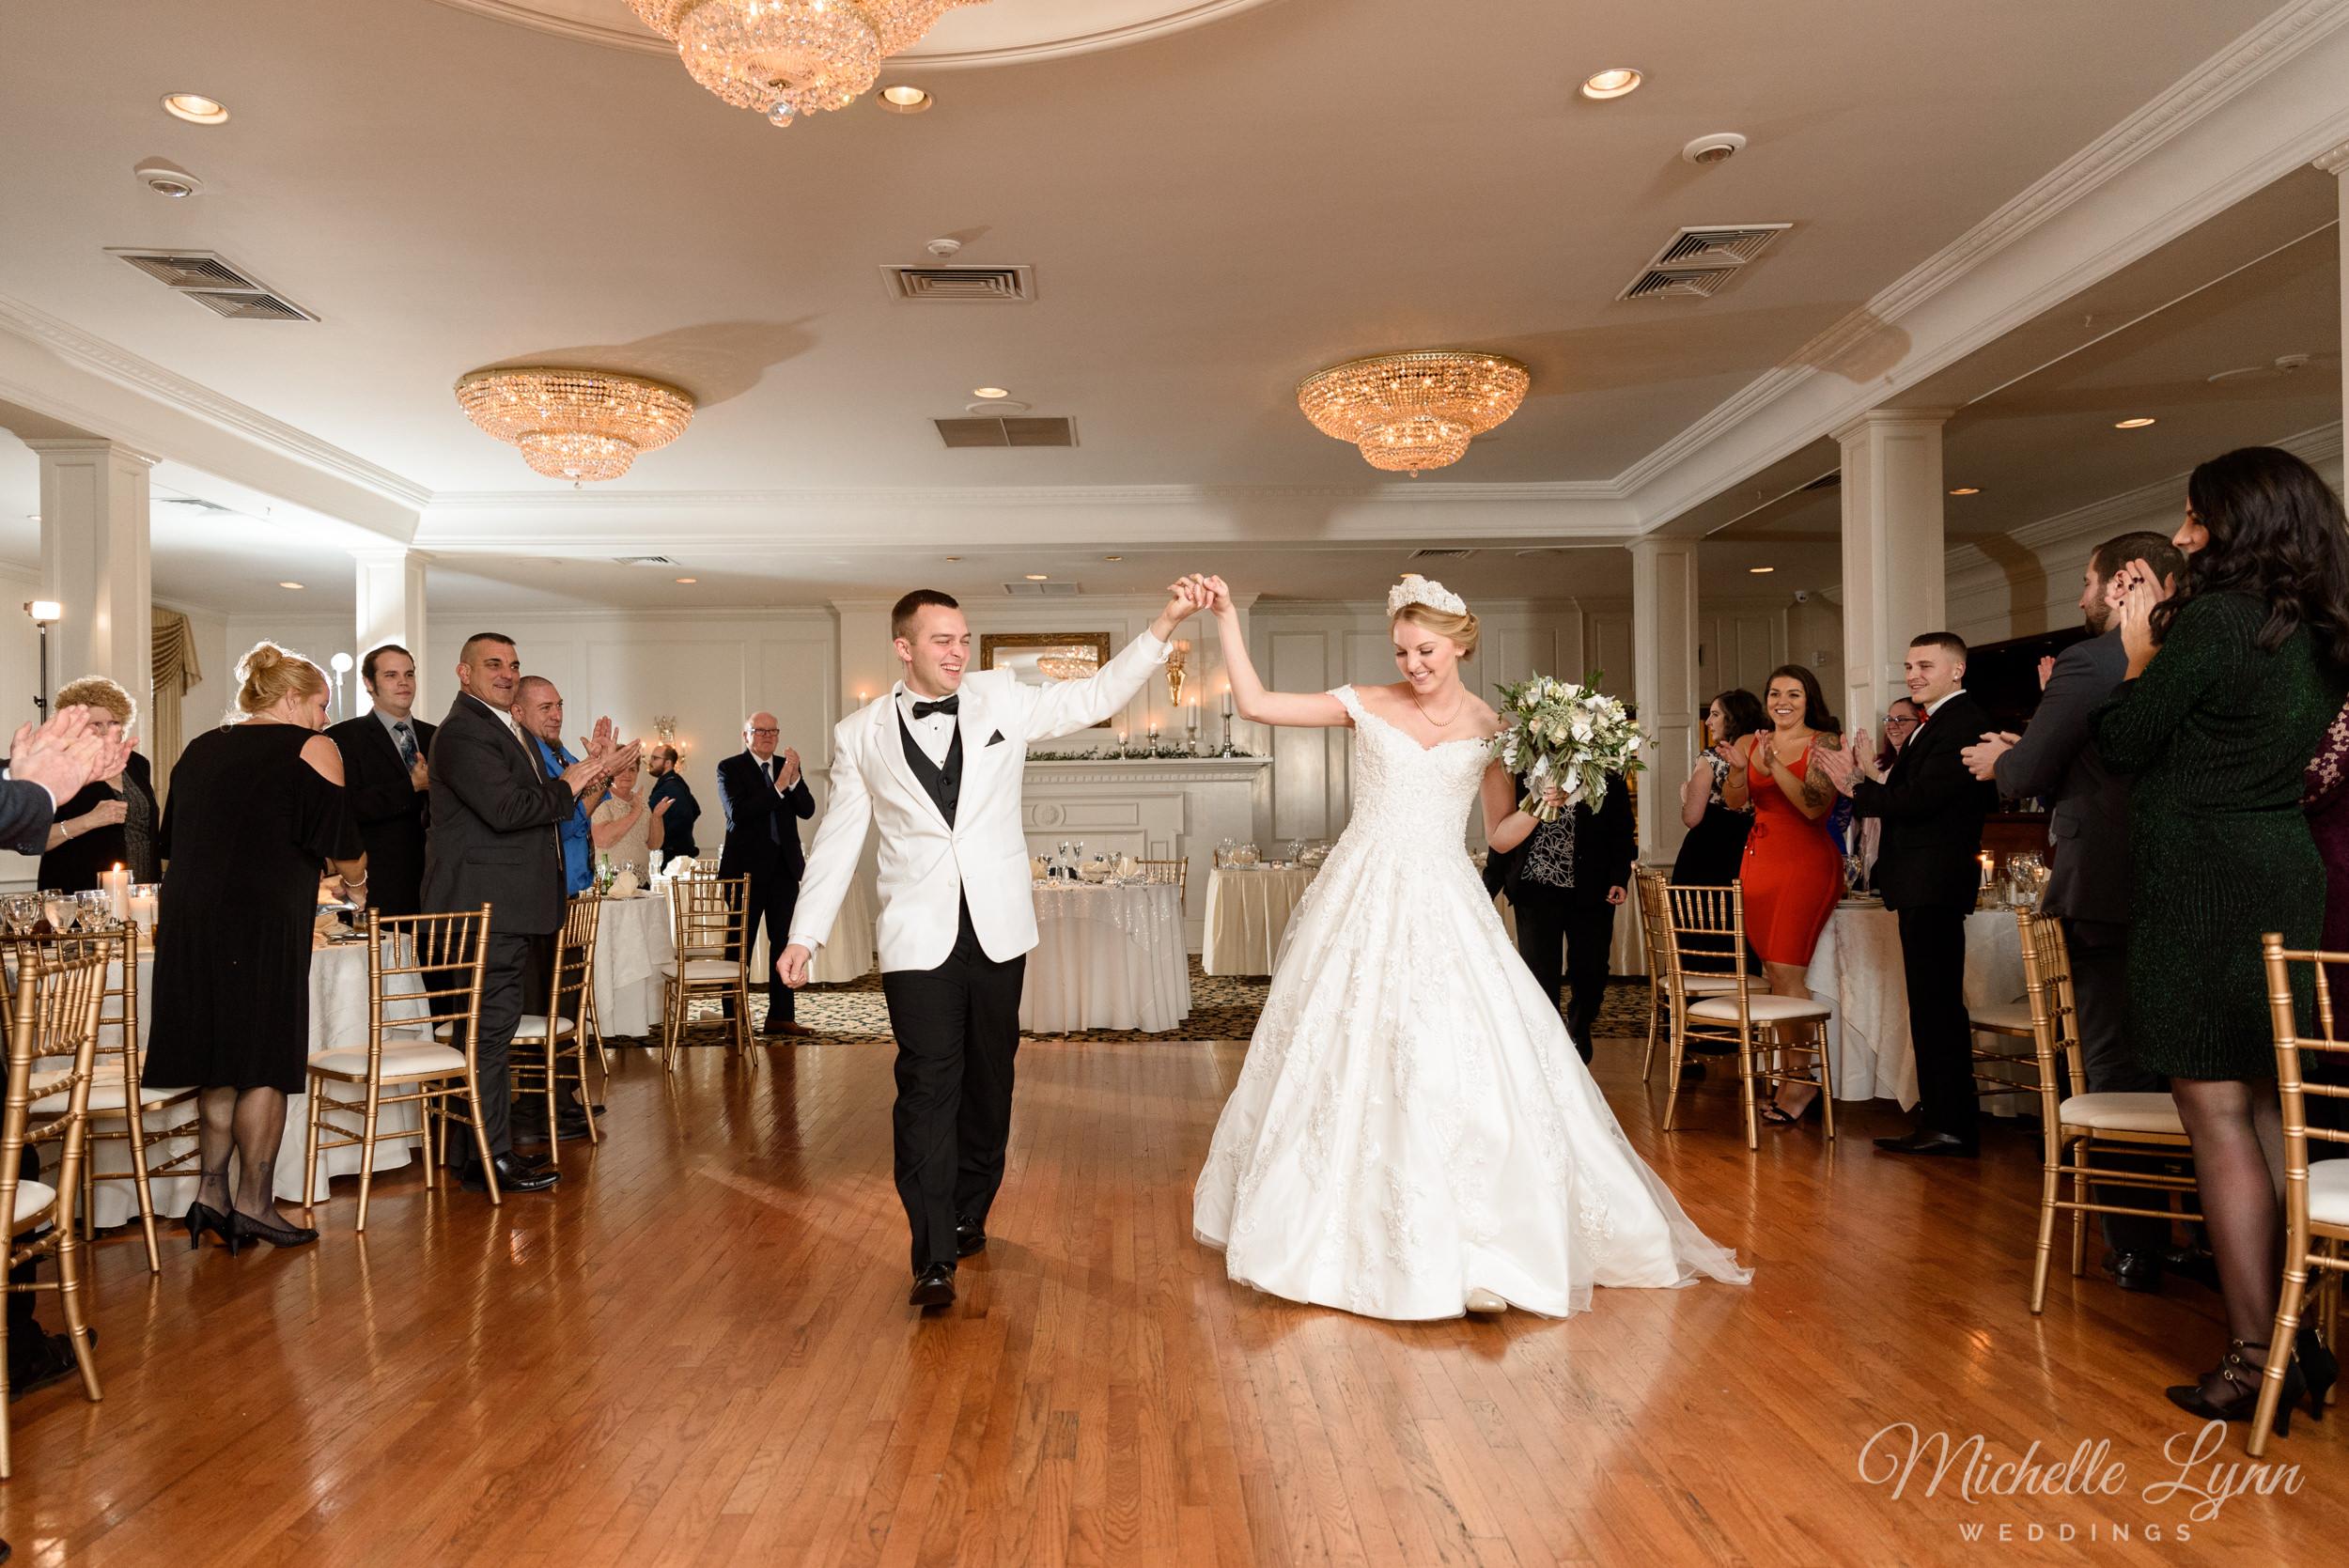 william-penn-inn-wedding-photography-mlw-80.jpg